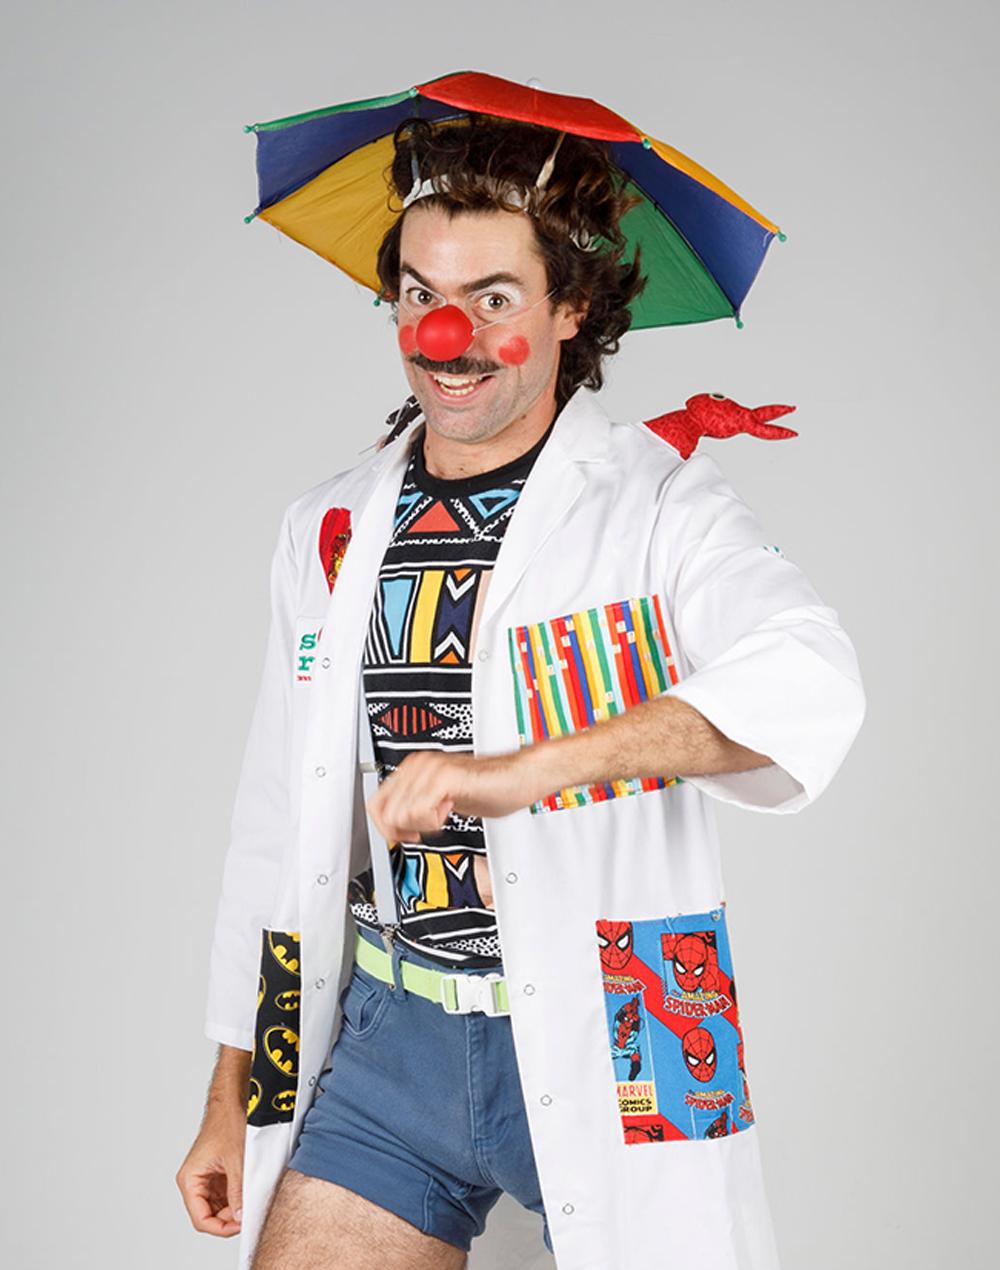 DR. BILIRRUBINO